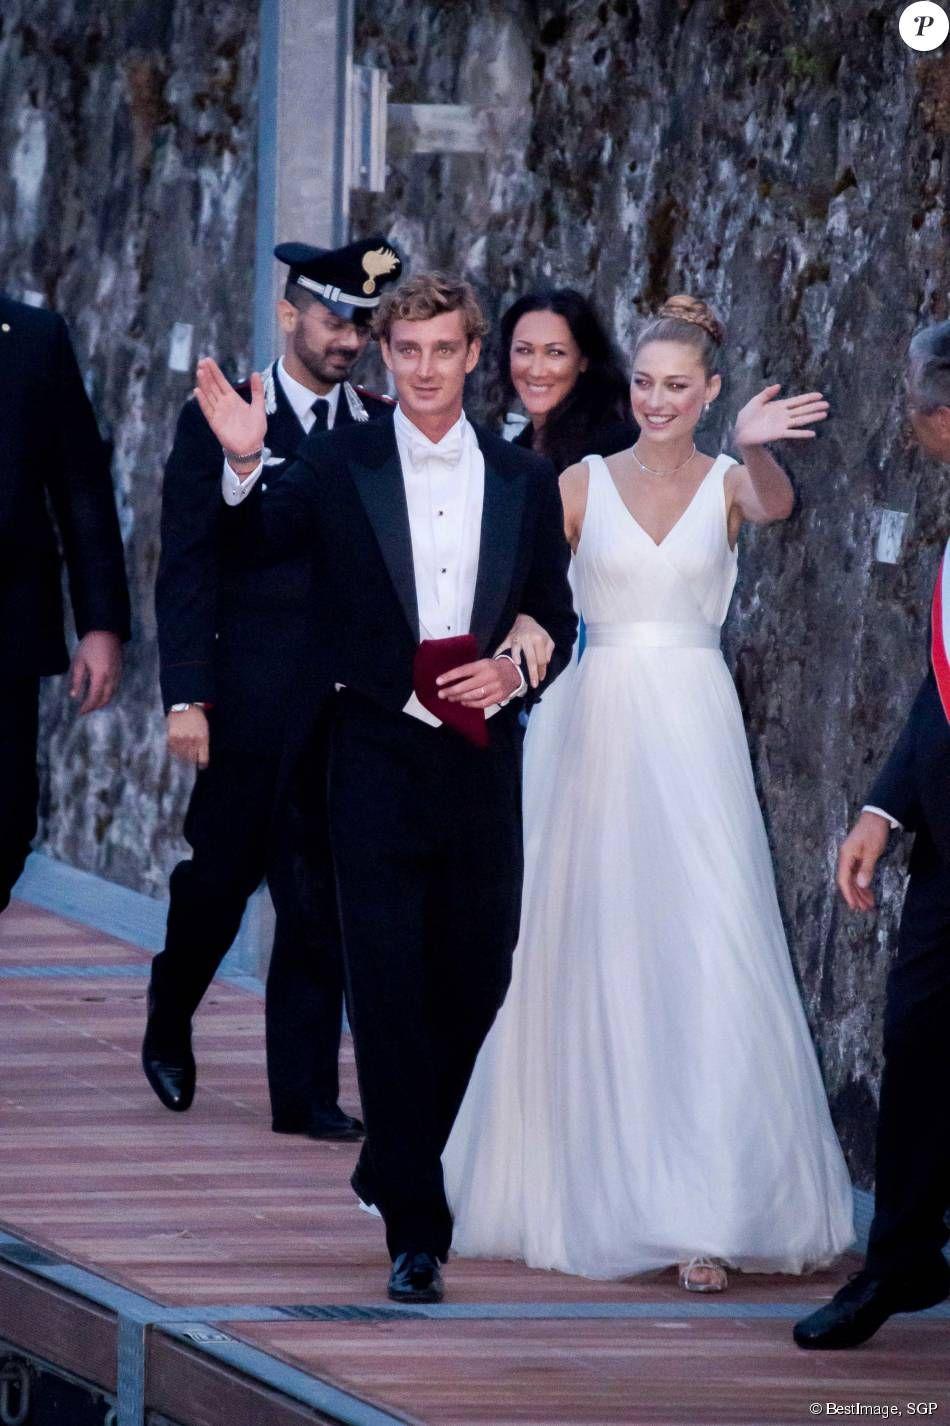 Pierre Casiraghi Et Beatrice Borromeo Un Mariage De Reve Wedding Dresses Celebrity Weddings Bride